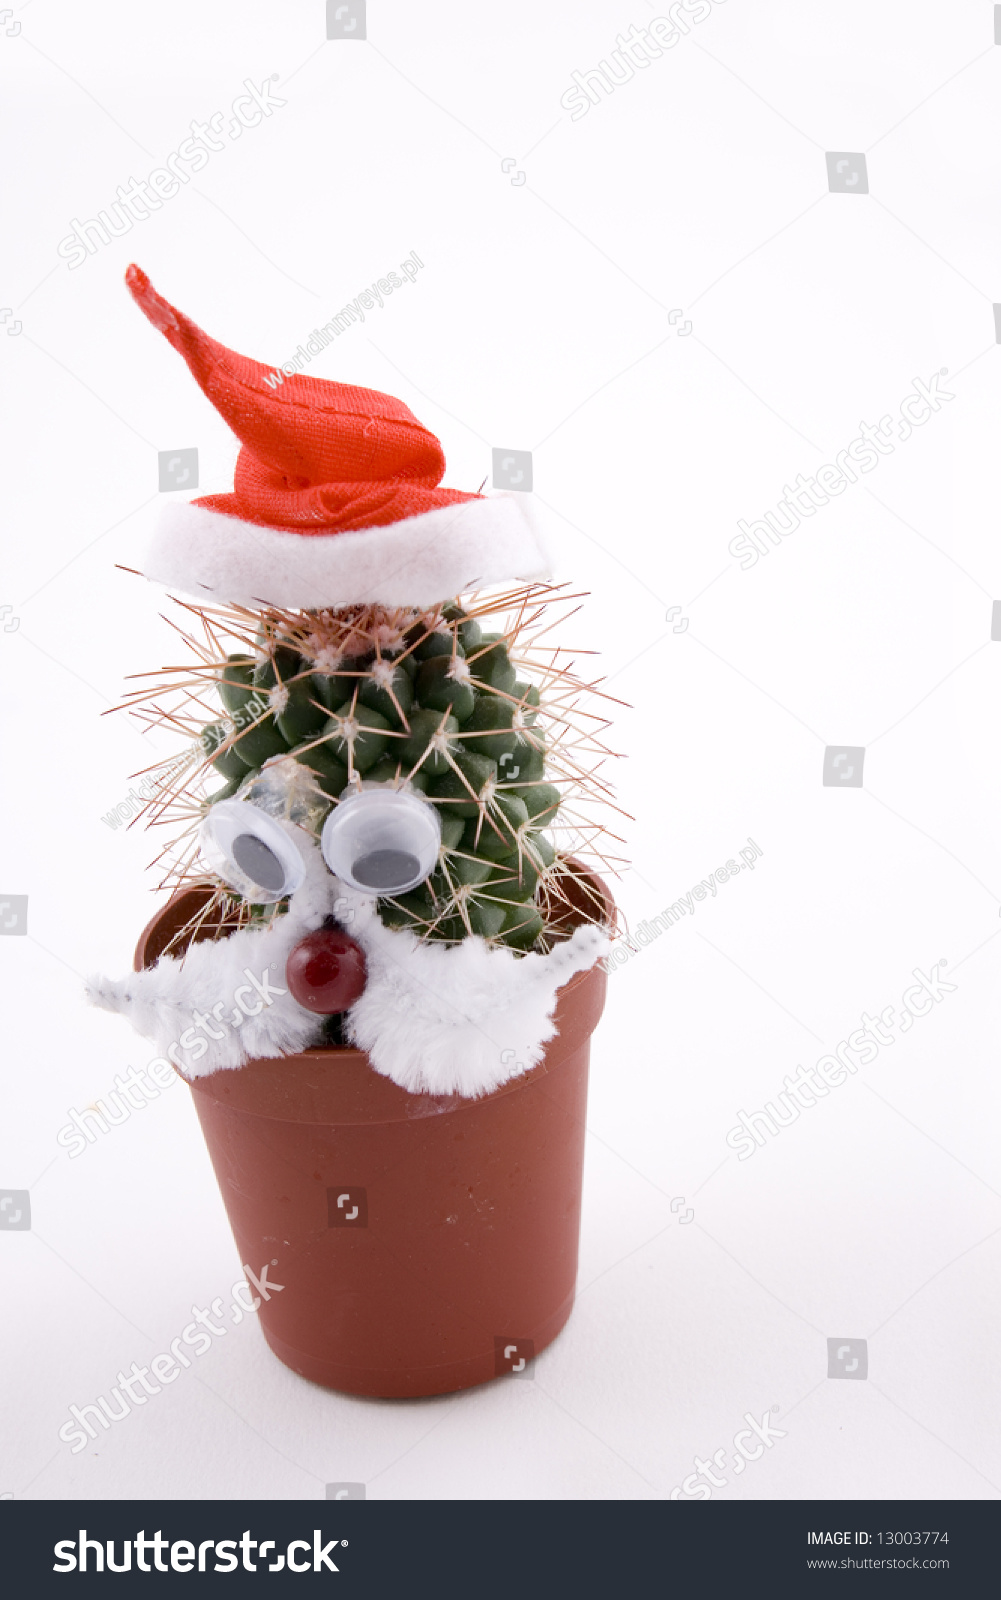 Cactus plant as a santa claus funny figure stock photo